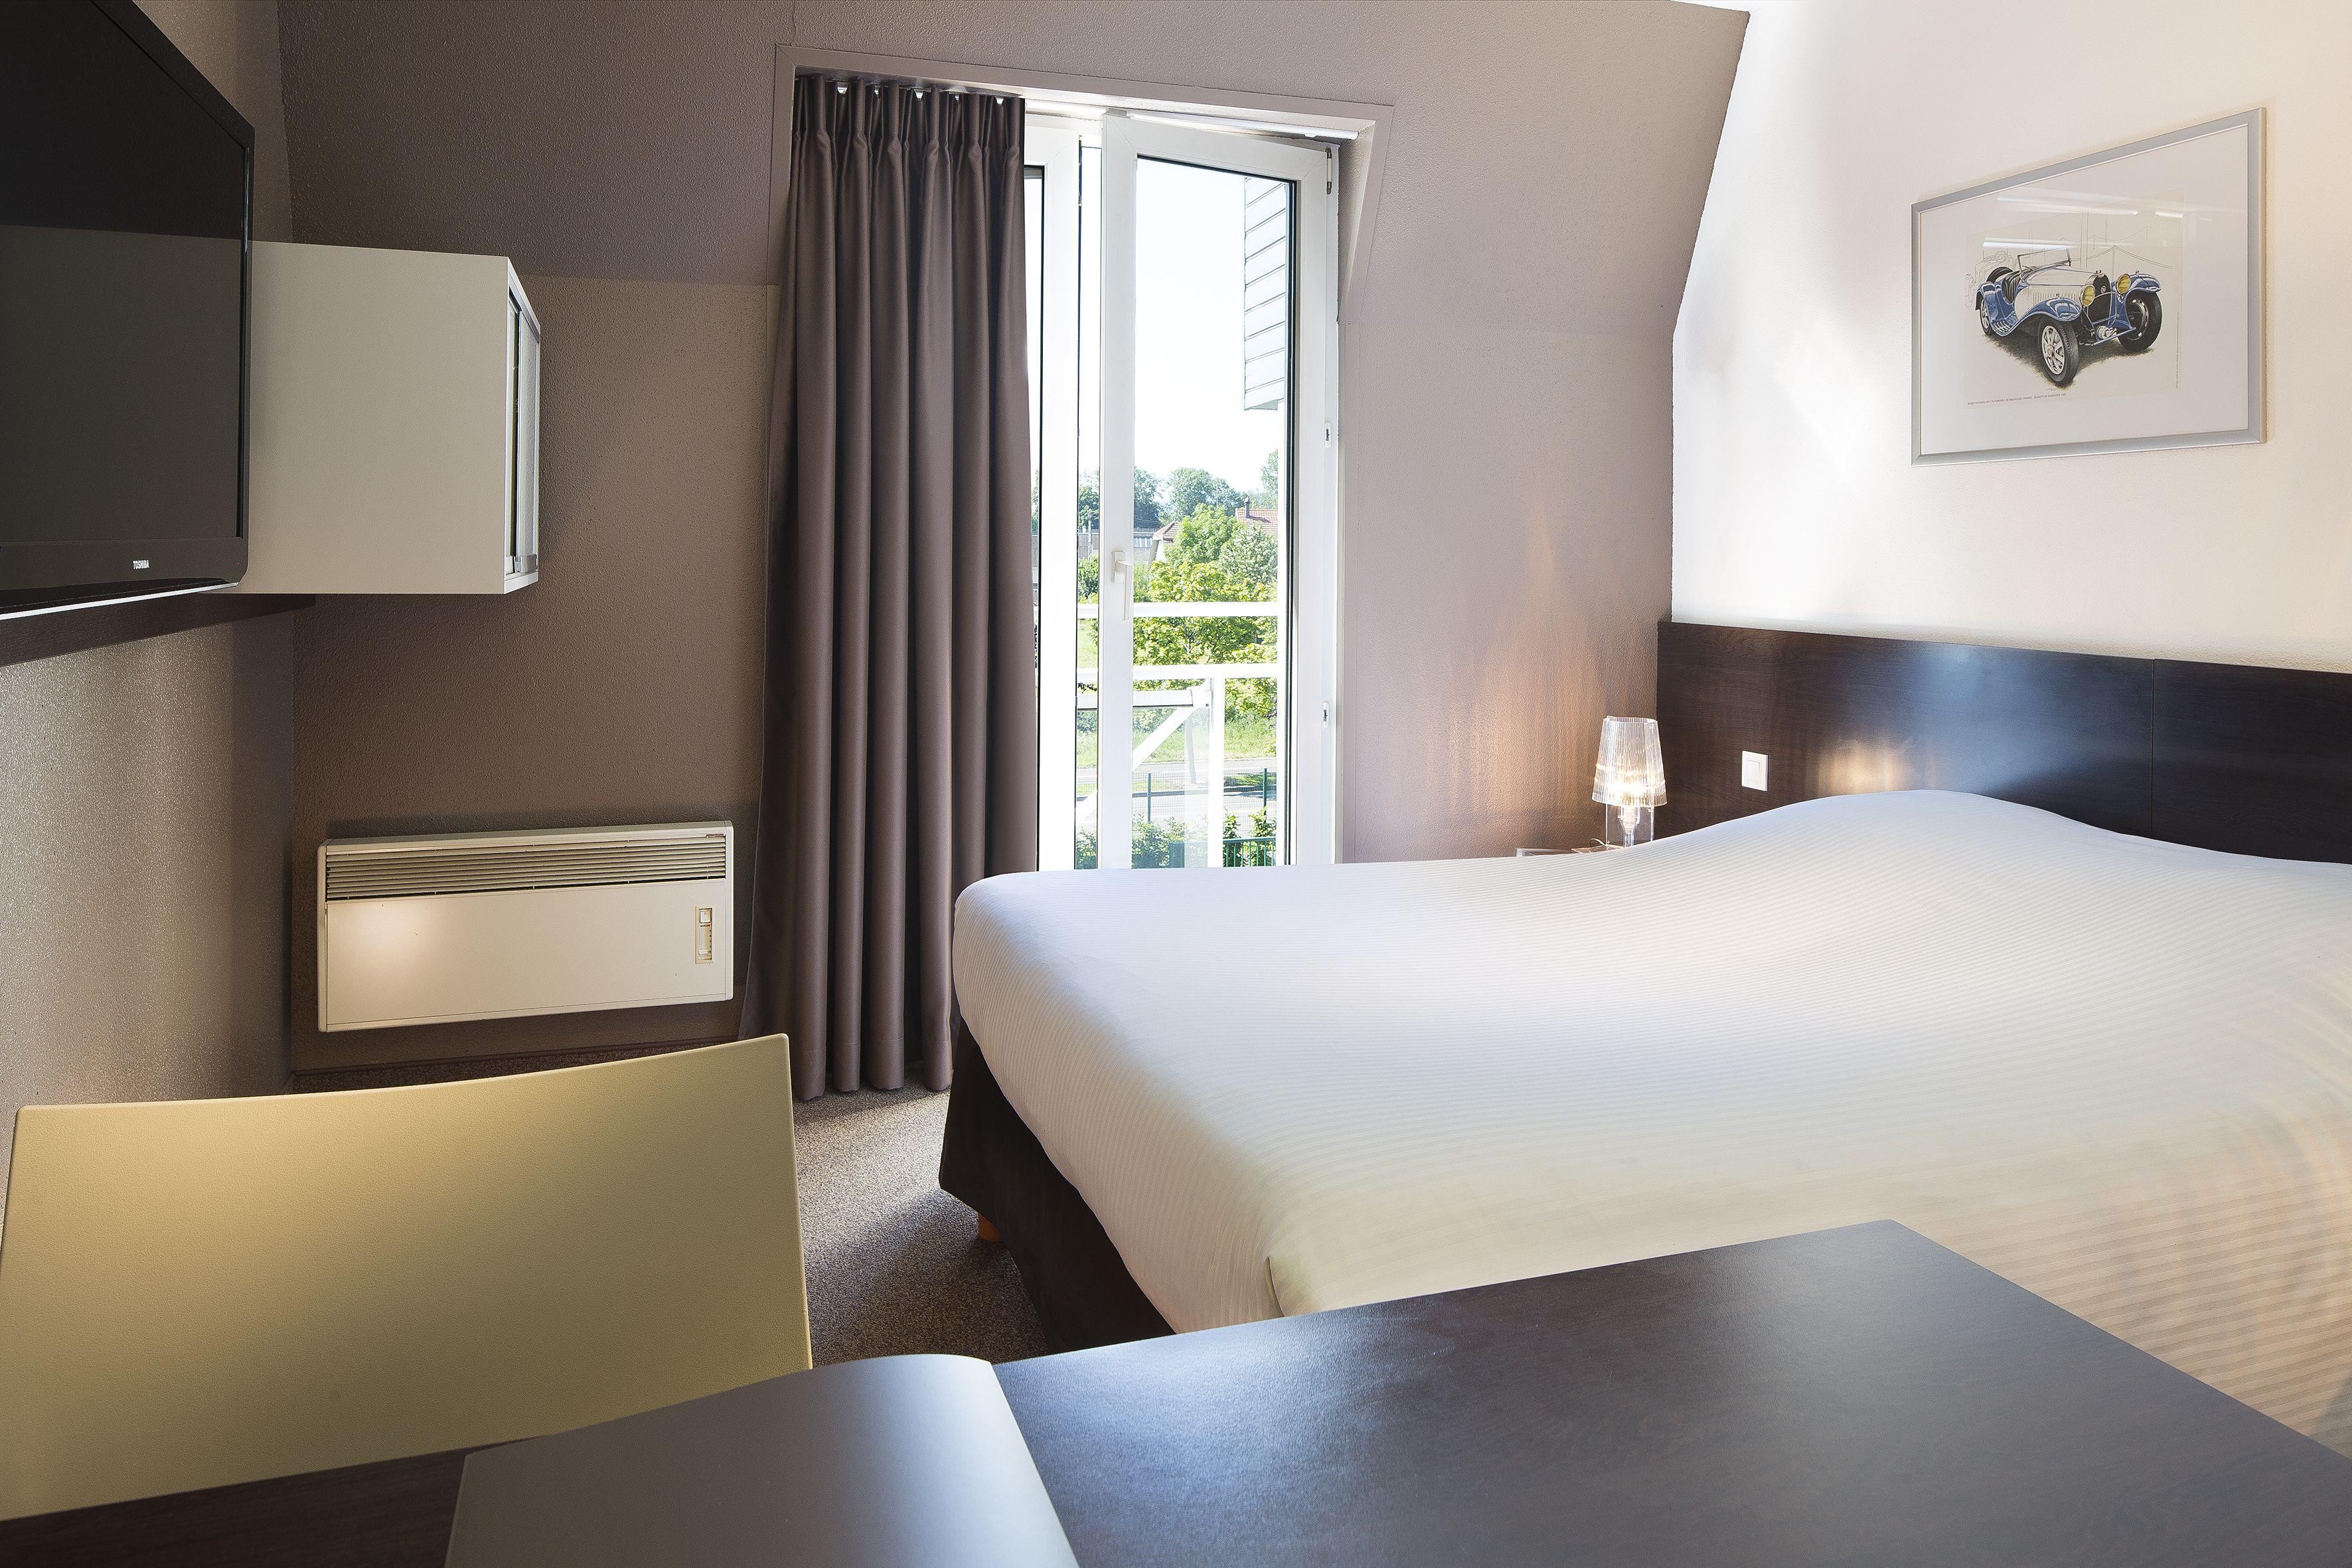 hotel room le bugatti molsheim france h tel bugatti molsheim pinterest france. Black Bedroom Furniture Sets. Home Design Ideas